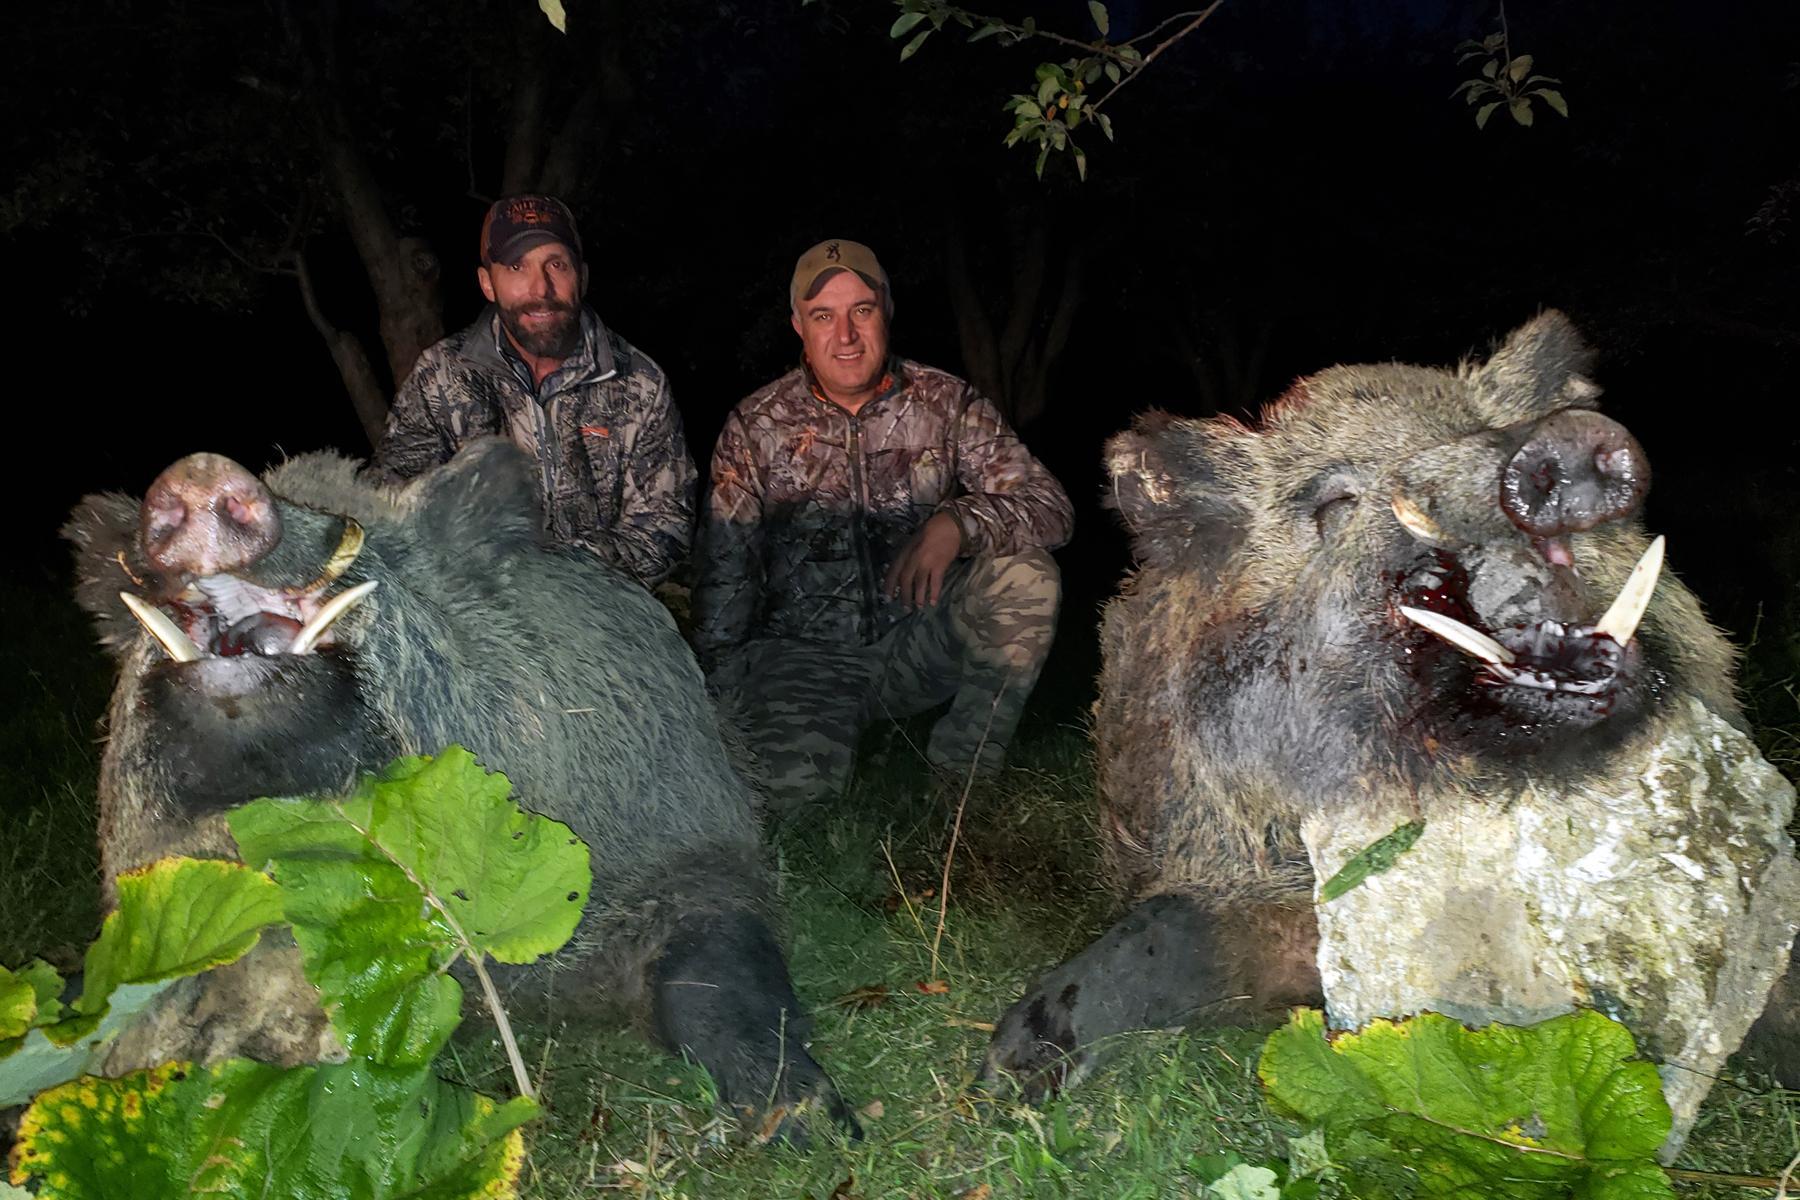 5 Days Stalking Wild Boar Hunting In Turkey Wild Boar Hunting In Turkey Optimum Hunting Optimum Hunting